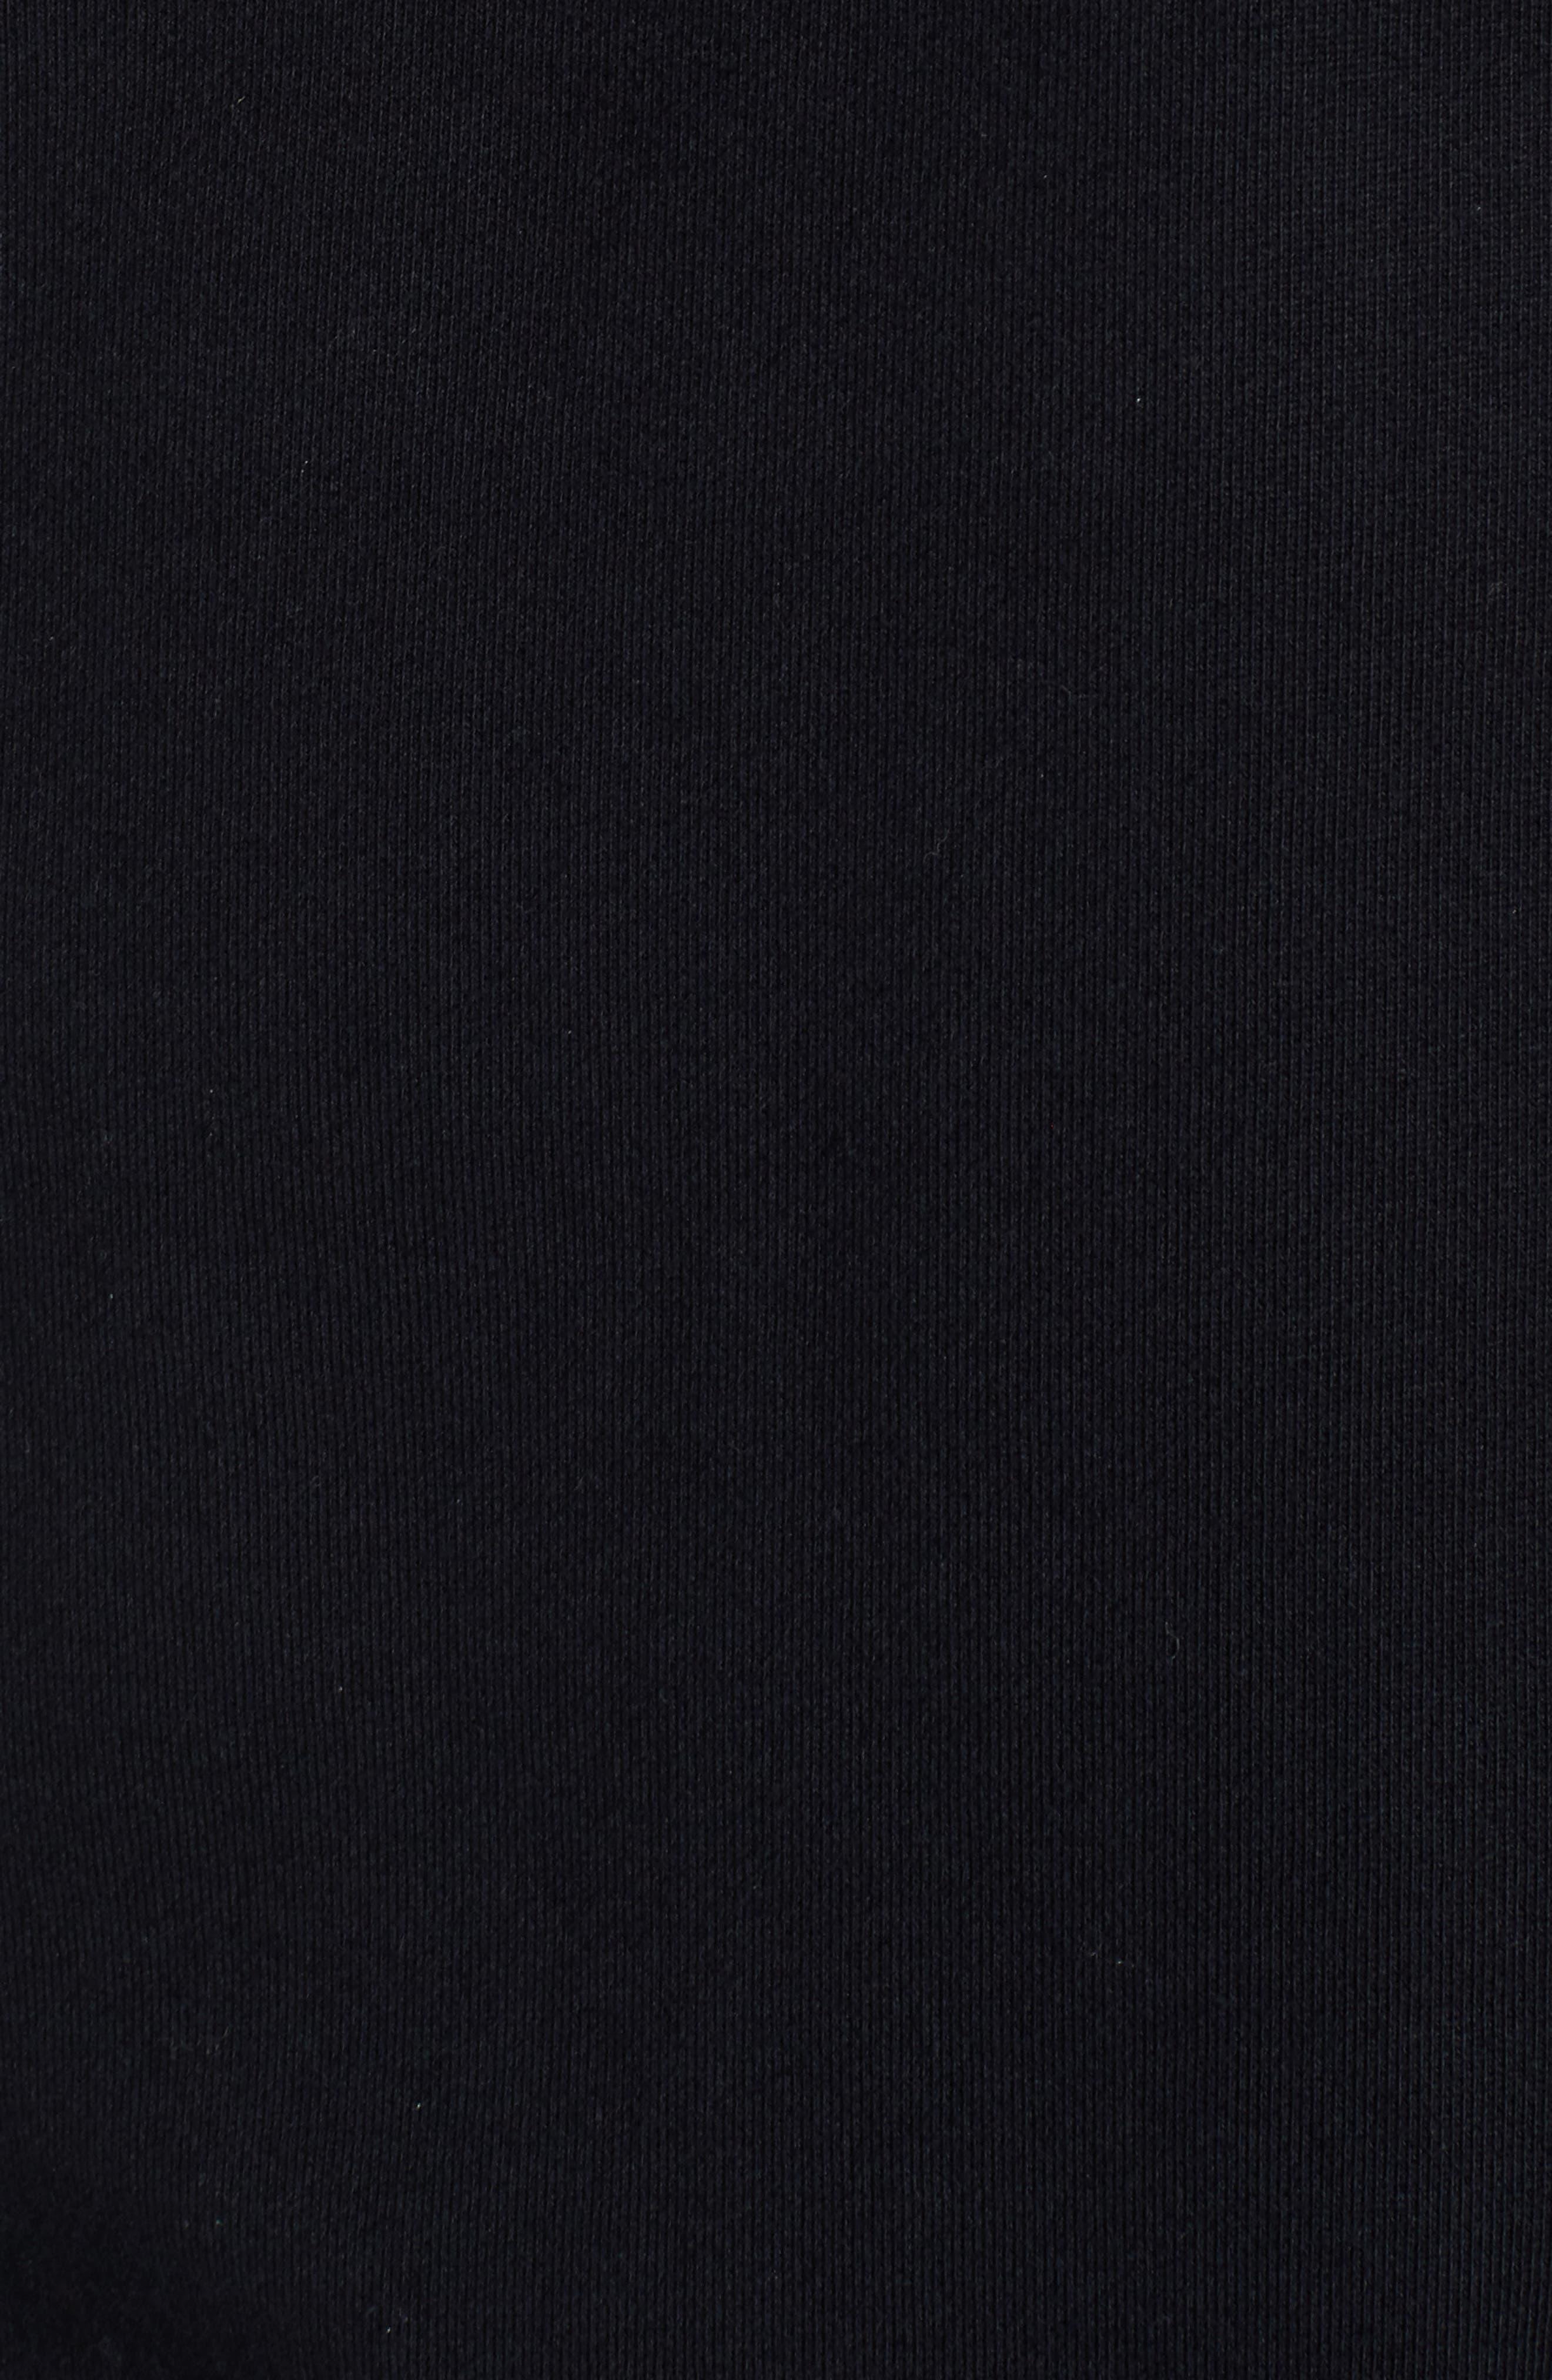 Cutoff Short Sleeve Sweatshirt,                             Alternate thumbnail 5, color,                             Black